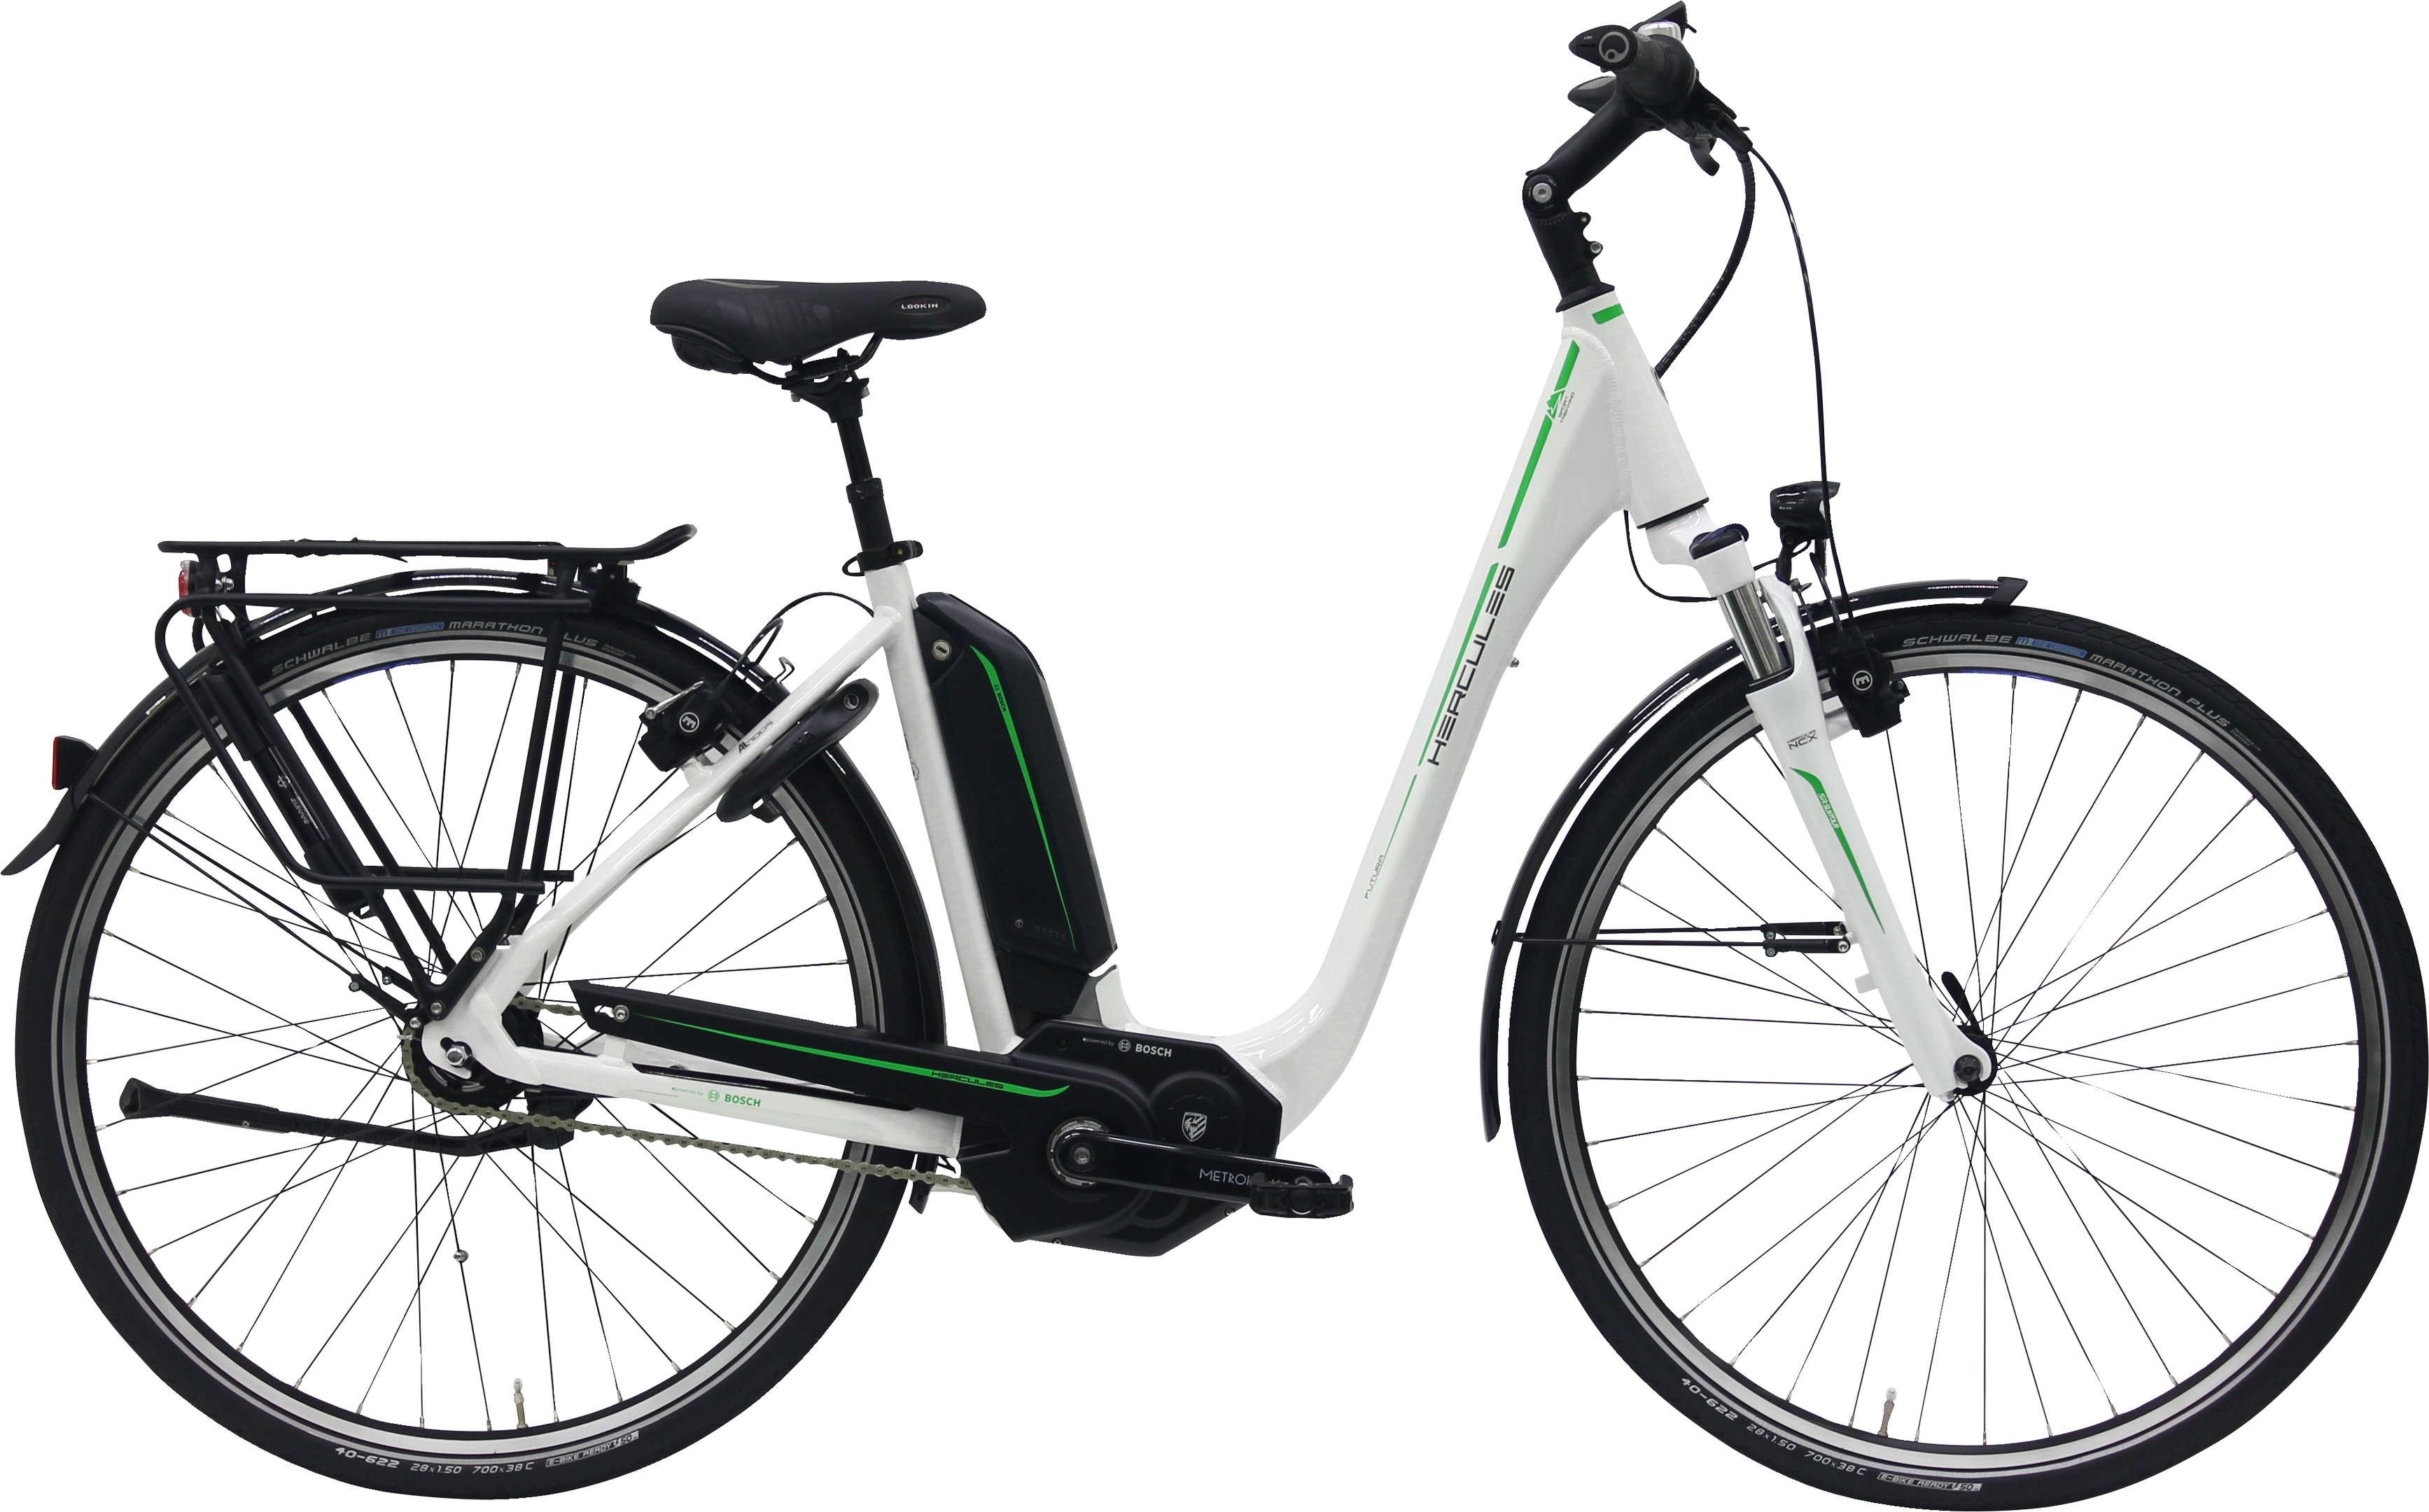 hercules e bike futura f8 eurorad bikeleasingeurorad. Black Bedroom Furniture Sets. Home Design Ideas